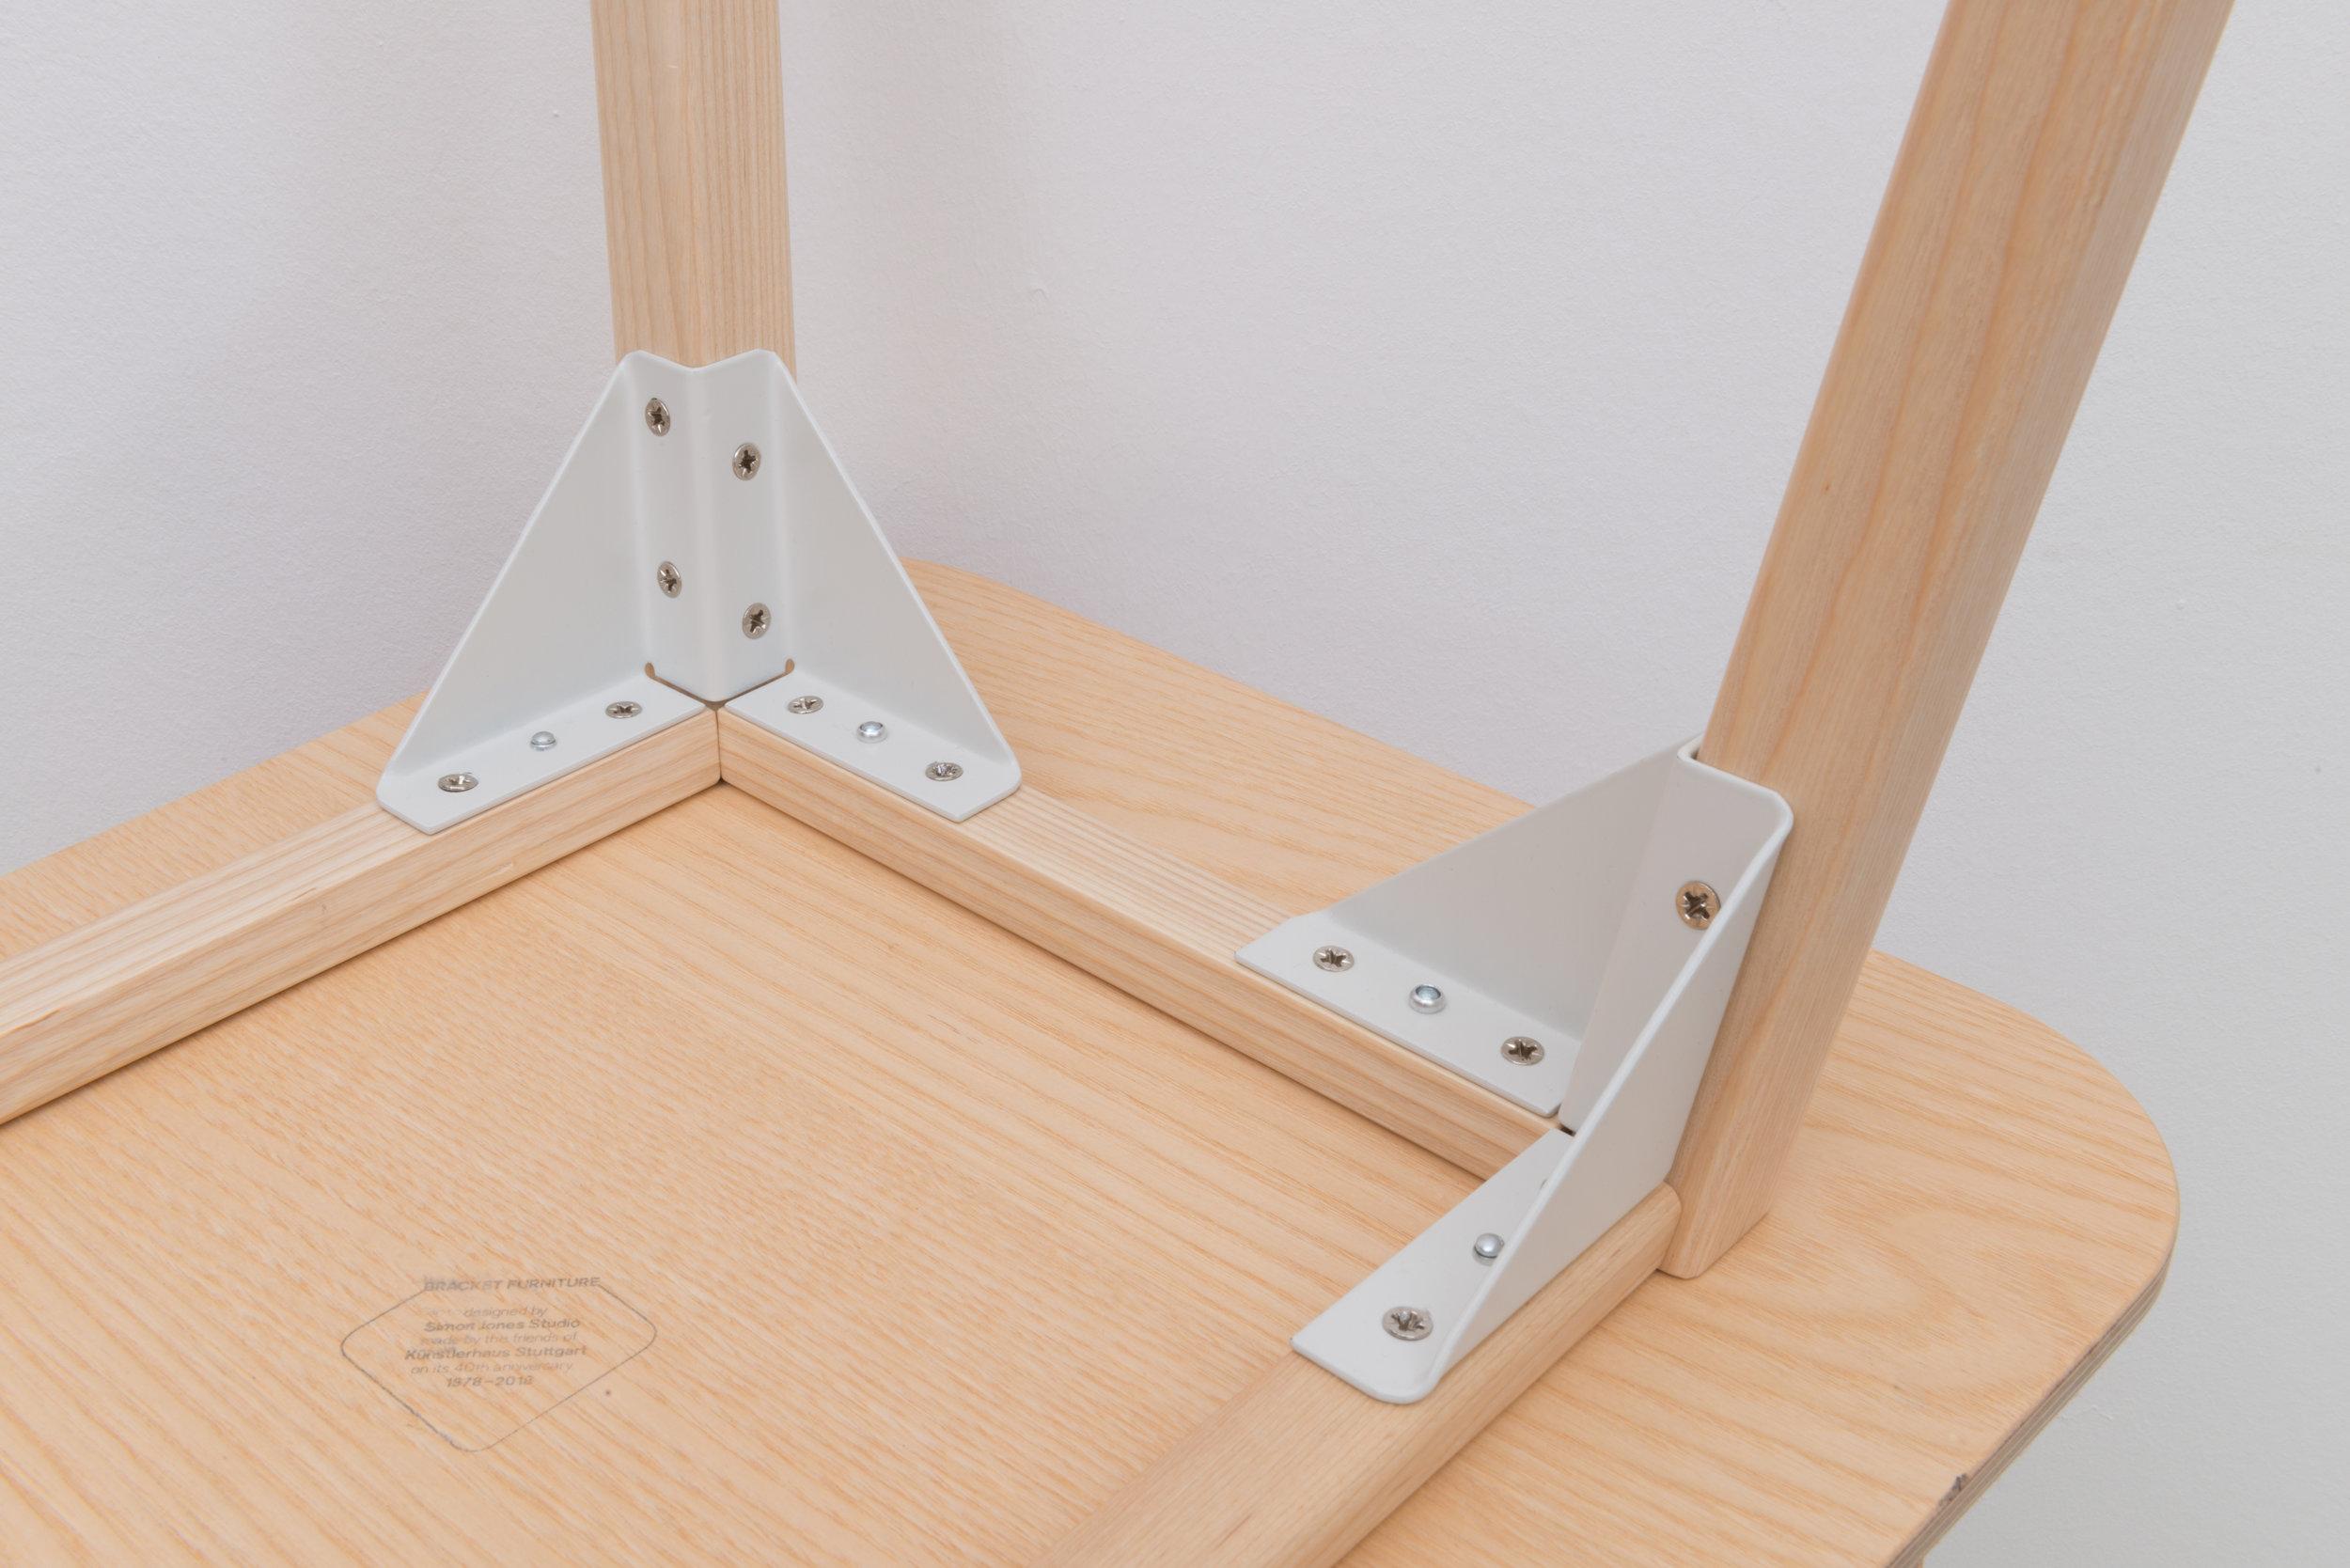 174 KHS 181207 Furniture individual-5403.jpg